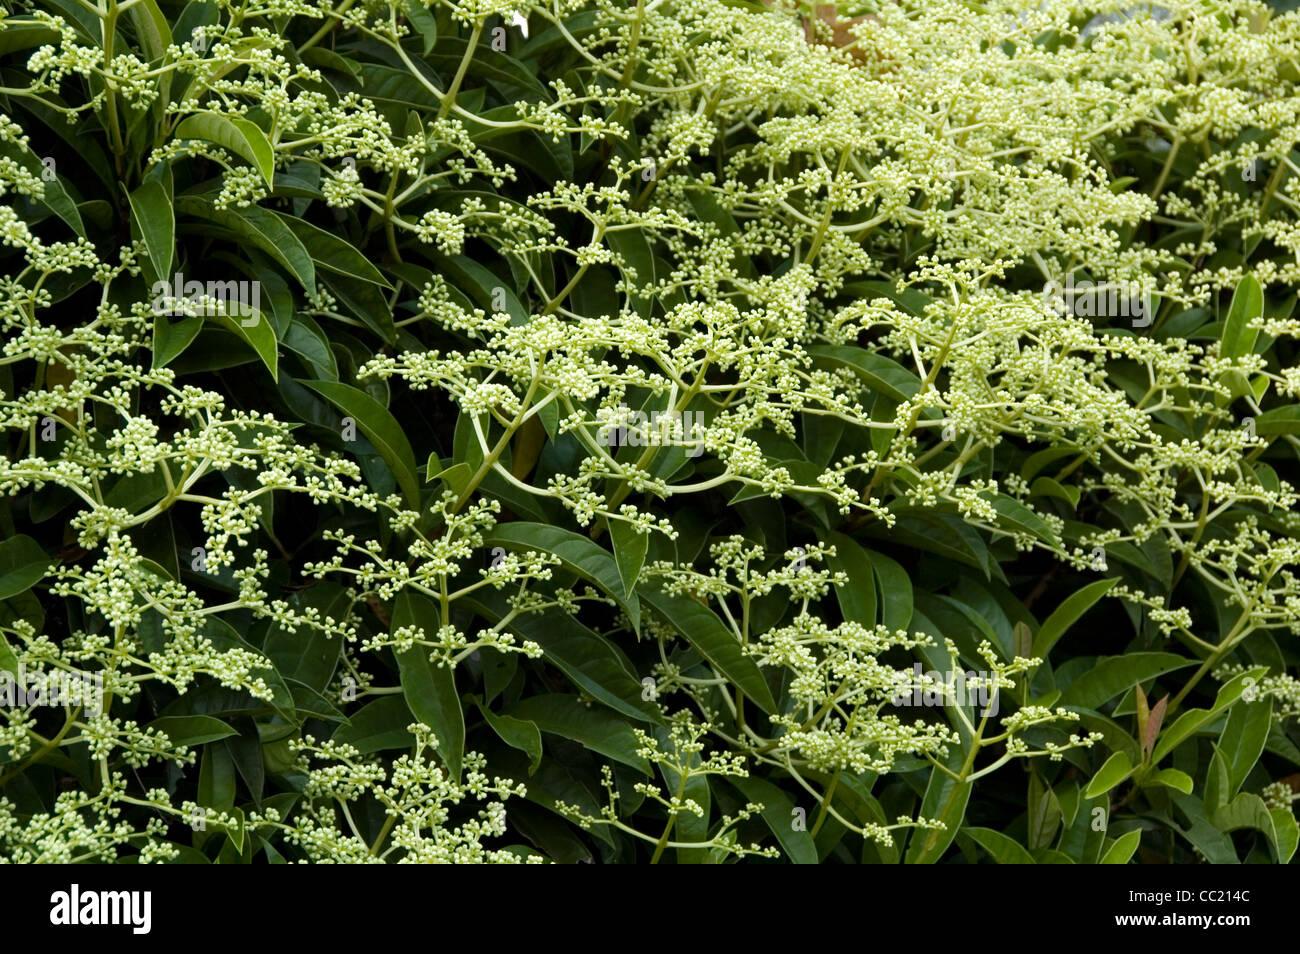 Pileostegia viburnumoides - Schizophragma - Escalada arbusto siempreverde. Foto de stock